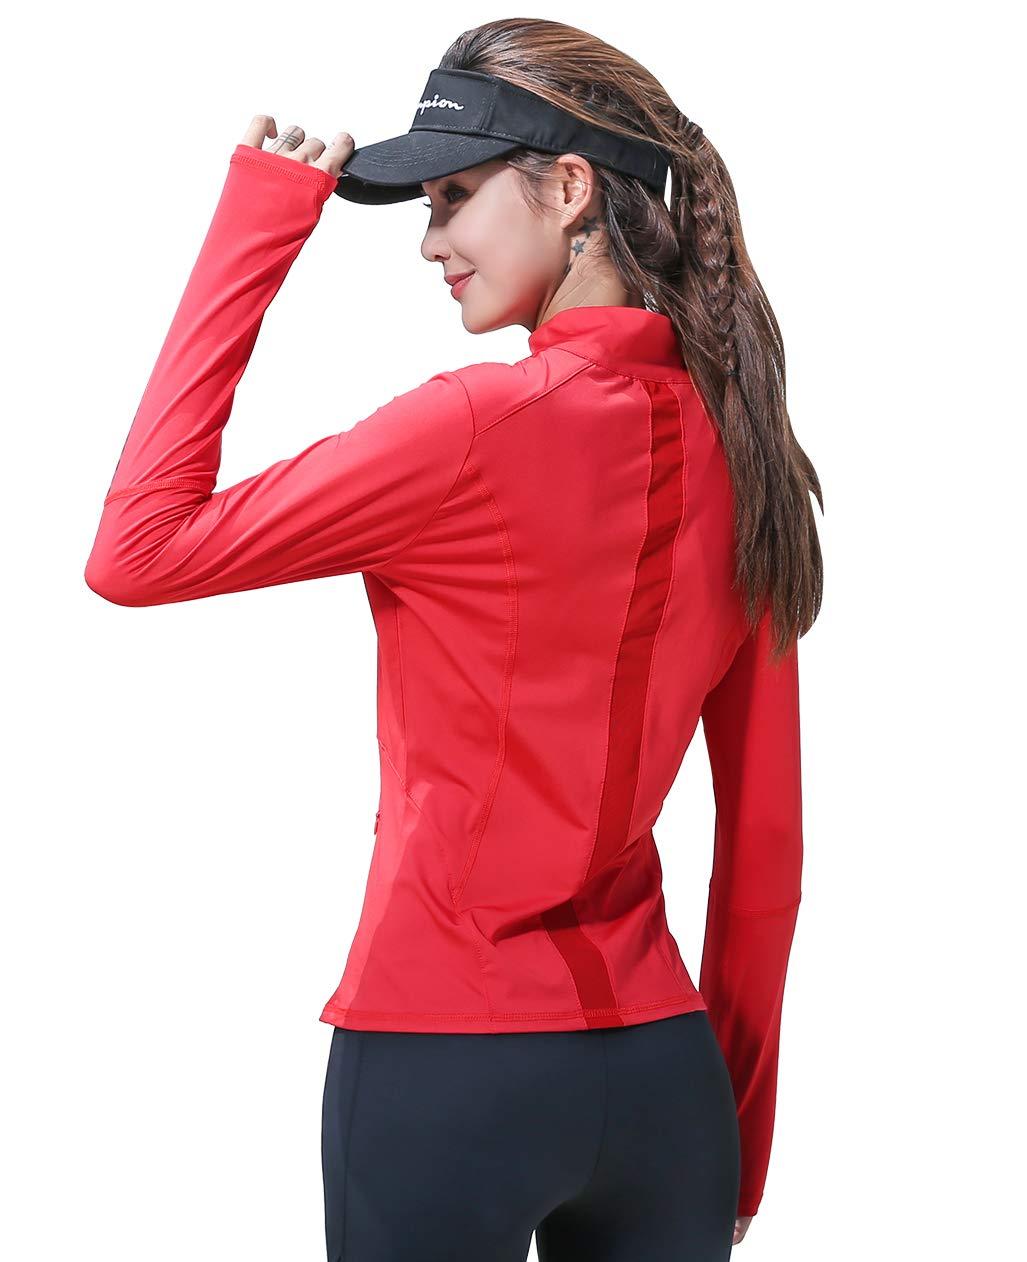 UDIY Women's Lightweight Yoga Running Training Full Zip Mesh Slim Fit Active Jacket, Red, Small